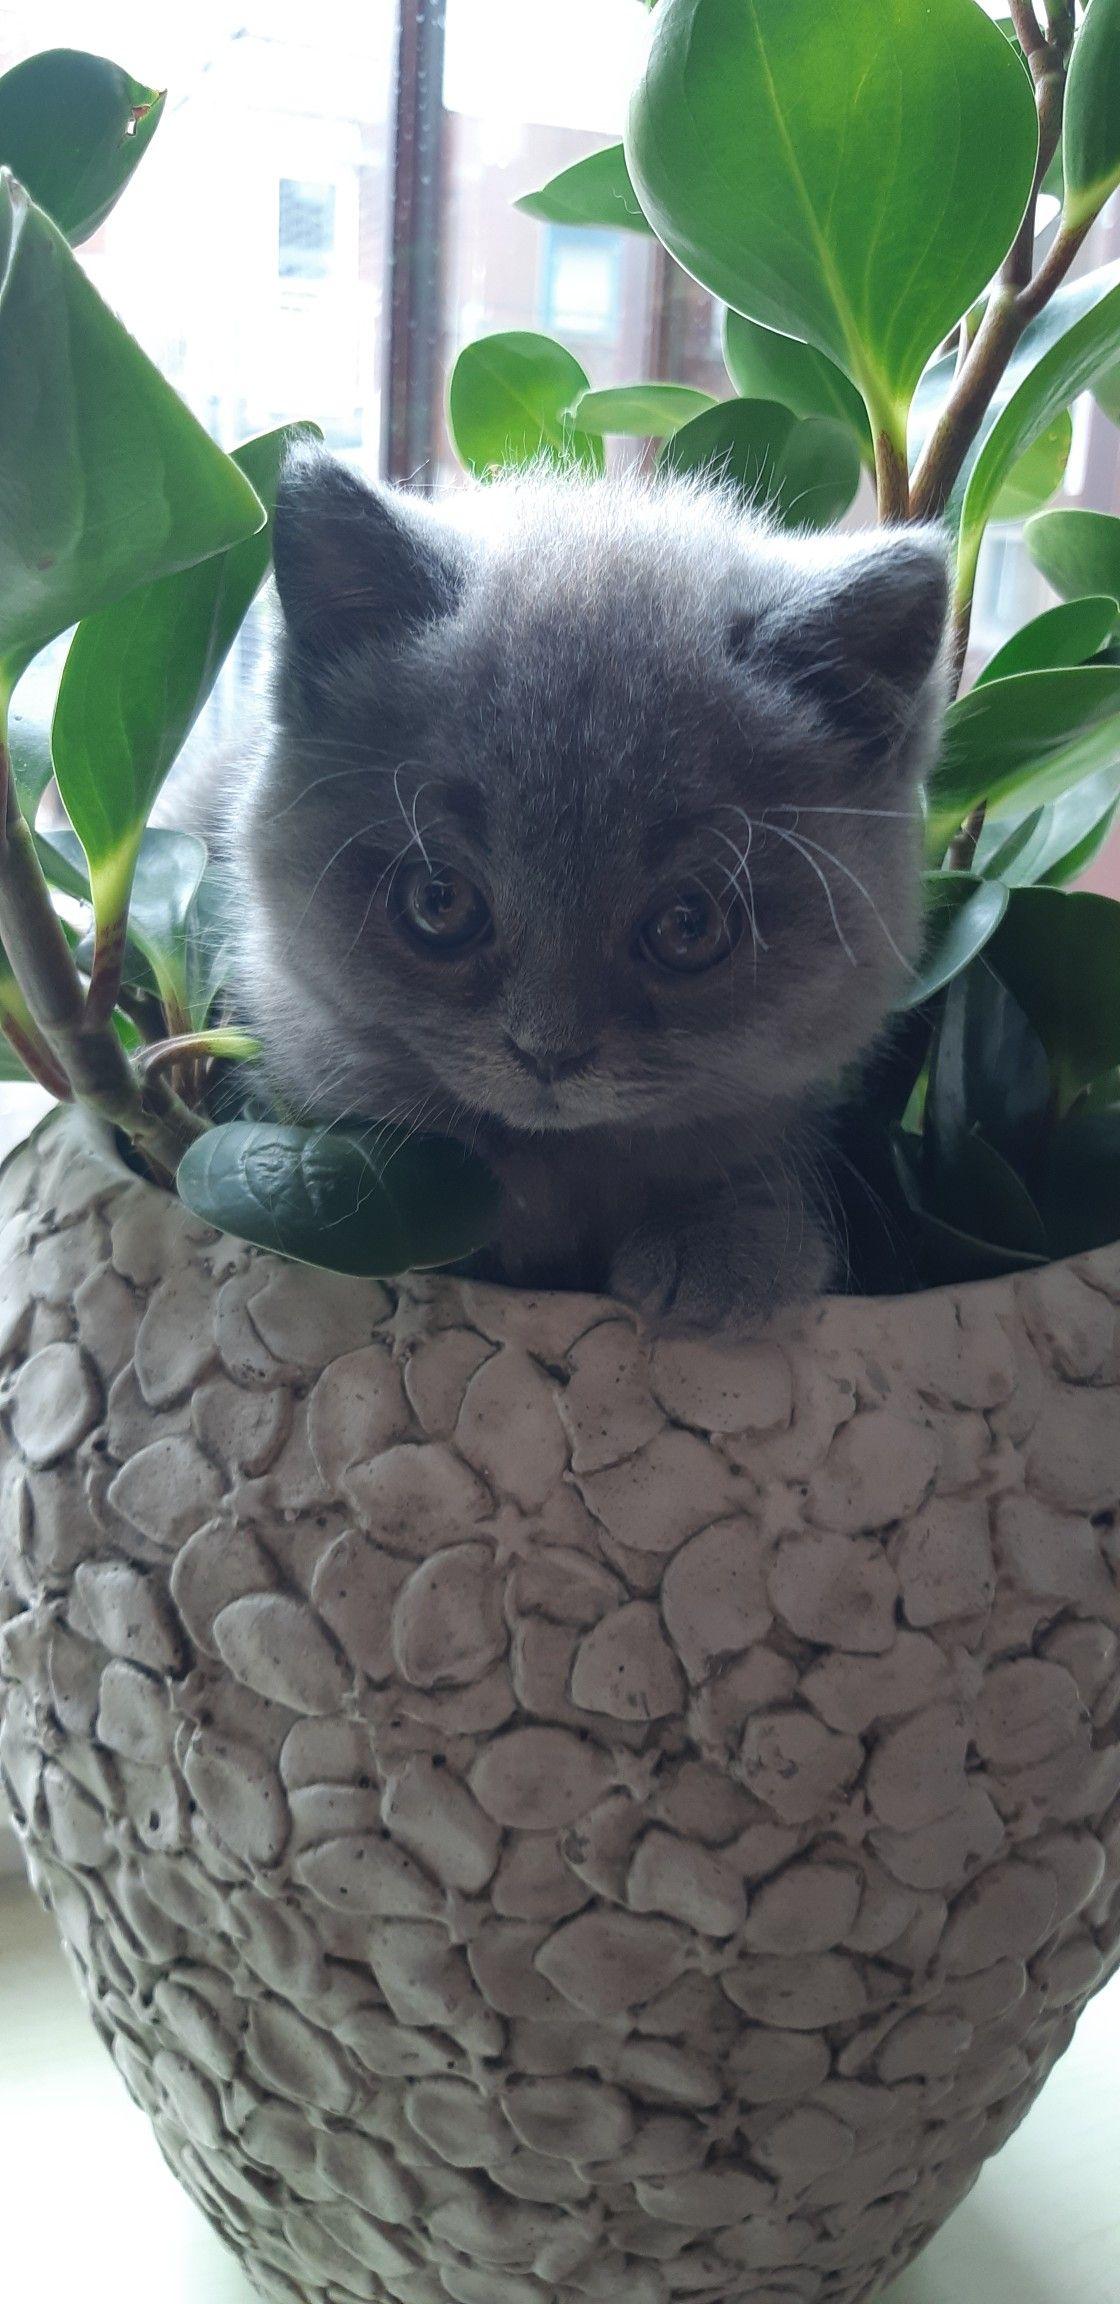 Fluffy Kittens For Sale Melbourne